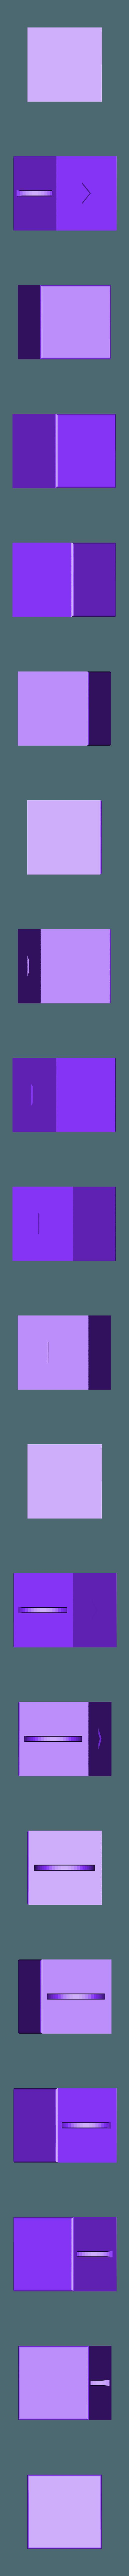 PennyPixelBlockArt4Faces.stl Download free STL file 3D Penny-Powered Pixel Art Blocks - Video Game Art • Model to 3D print, tonyyoungblood